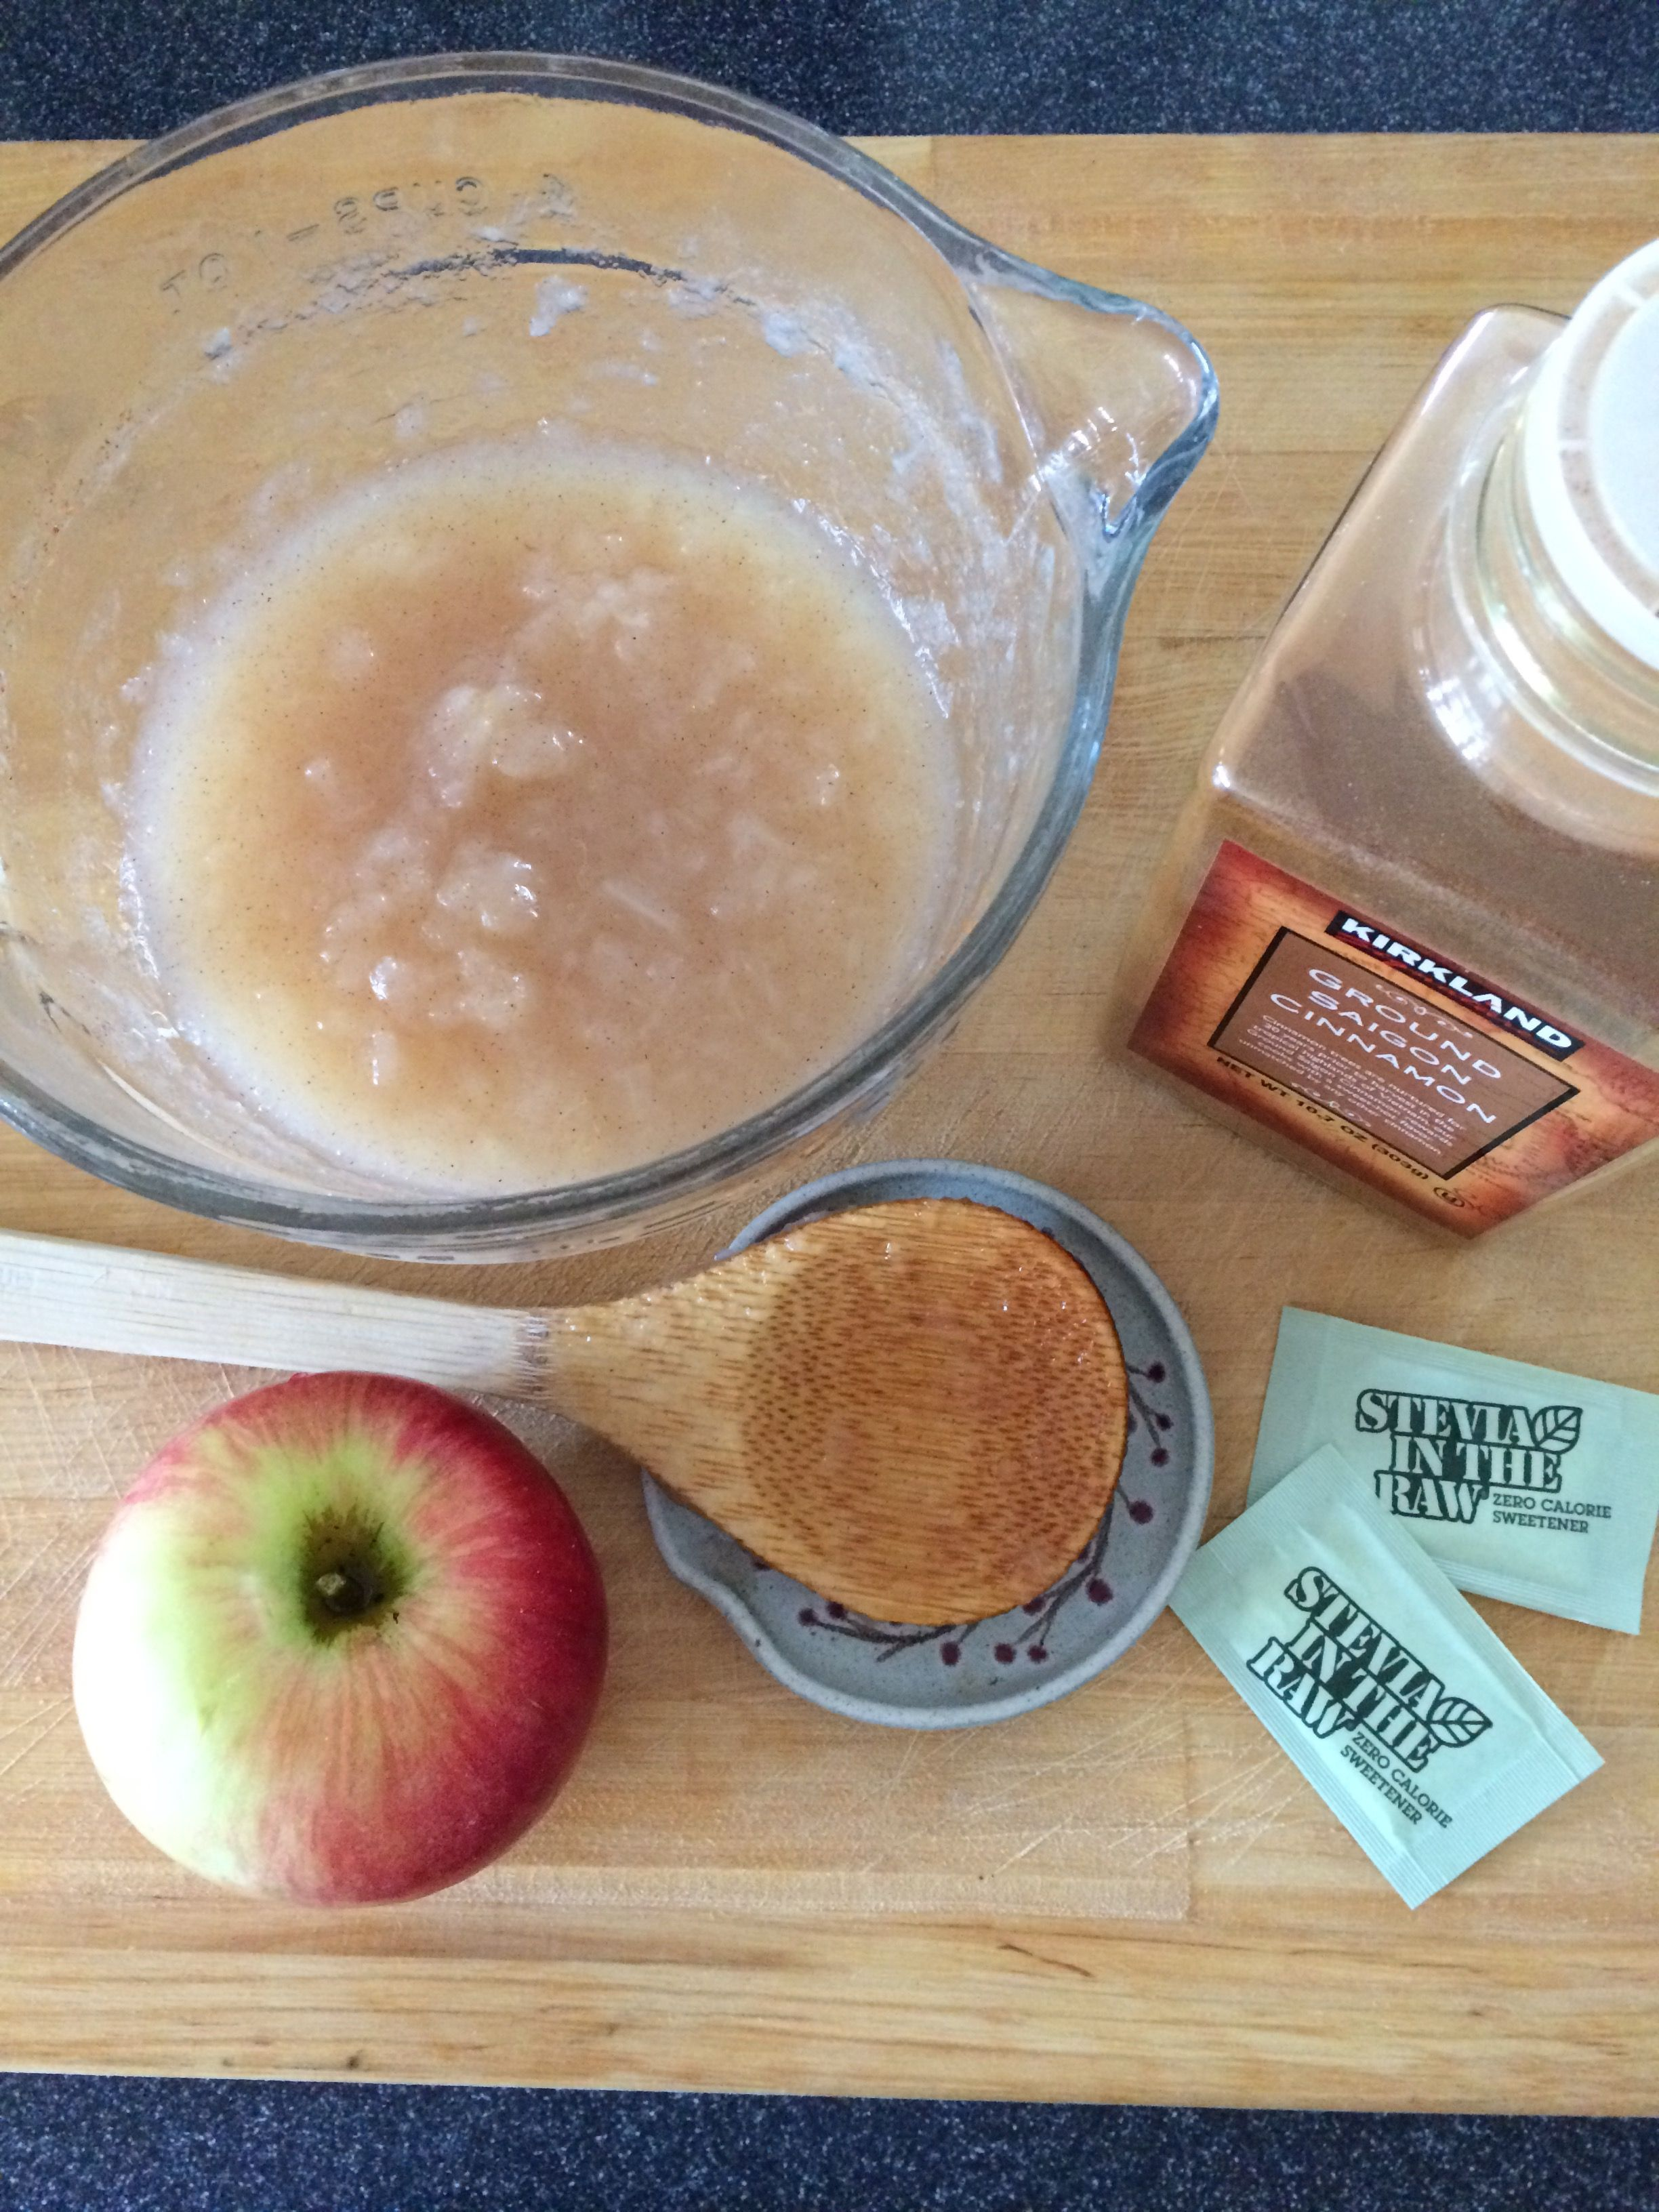 Homemade applesauce using Stevia. Yum!